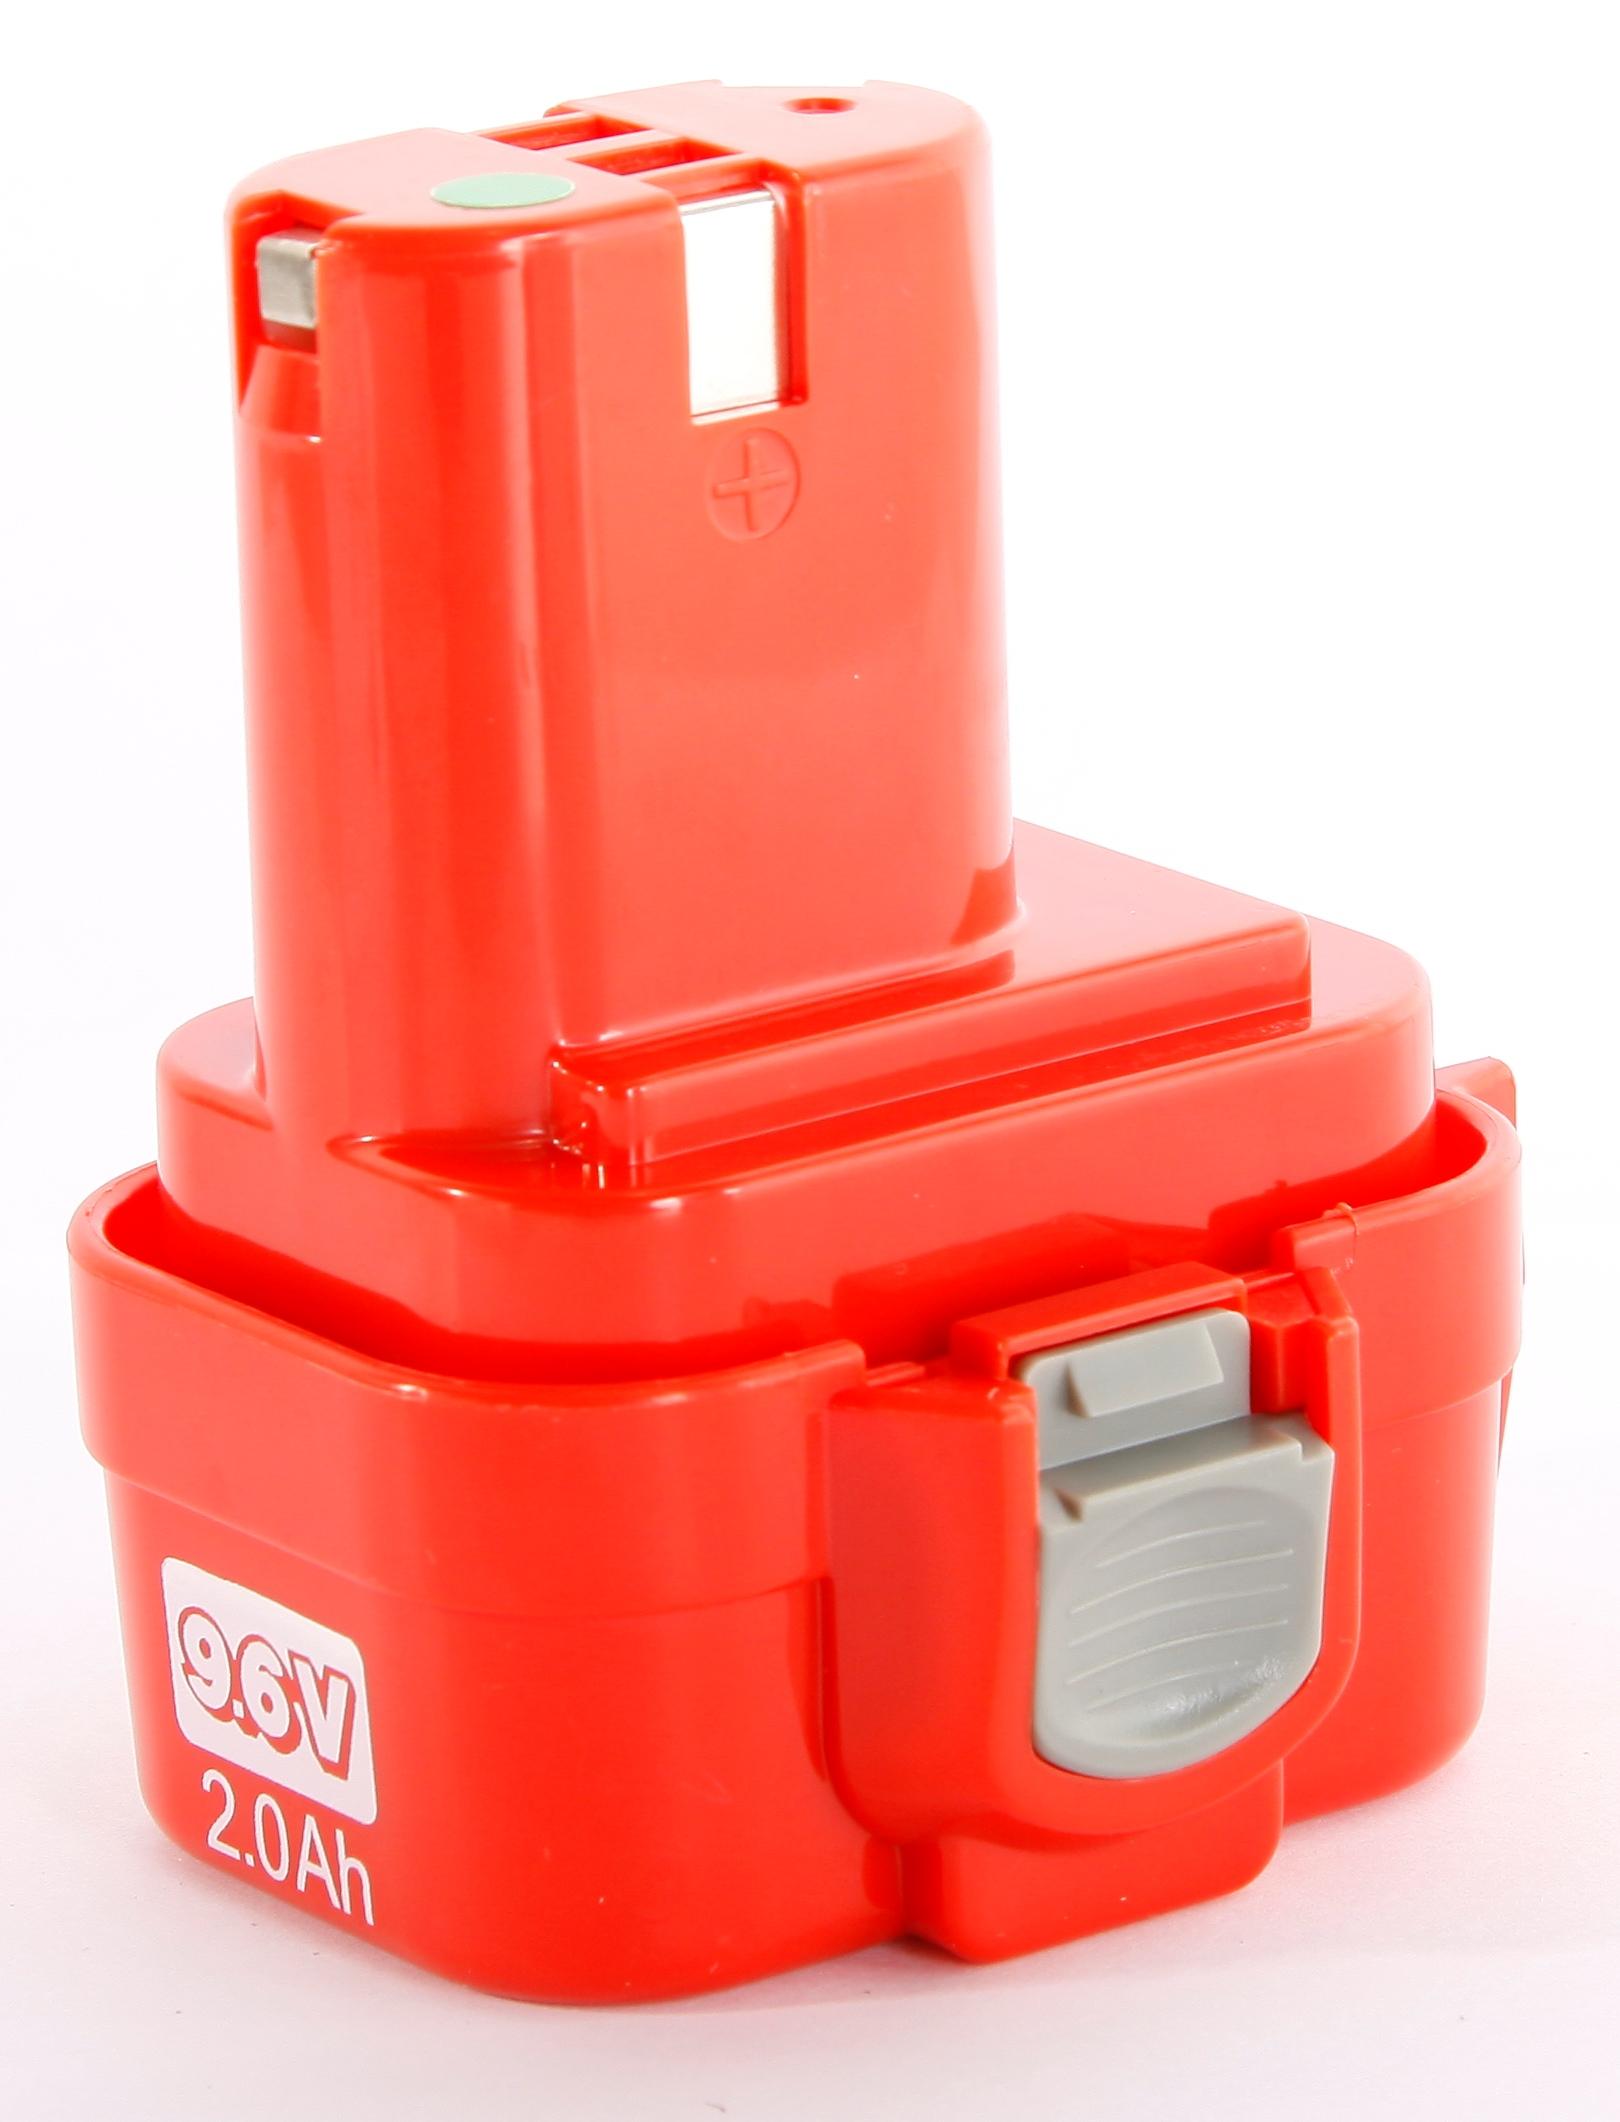 Аккумулятор Hammer Akm920 9.6В 2.0Ач цена